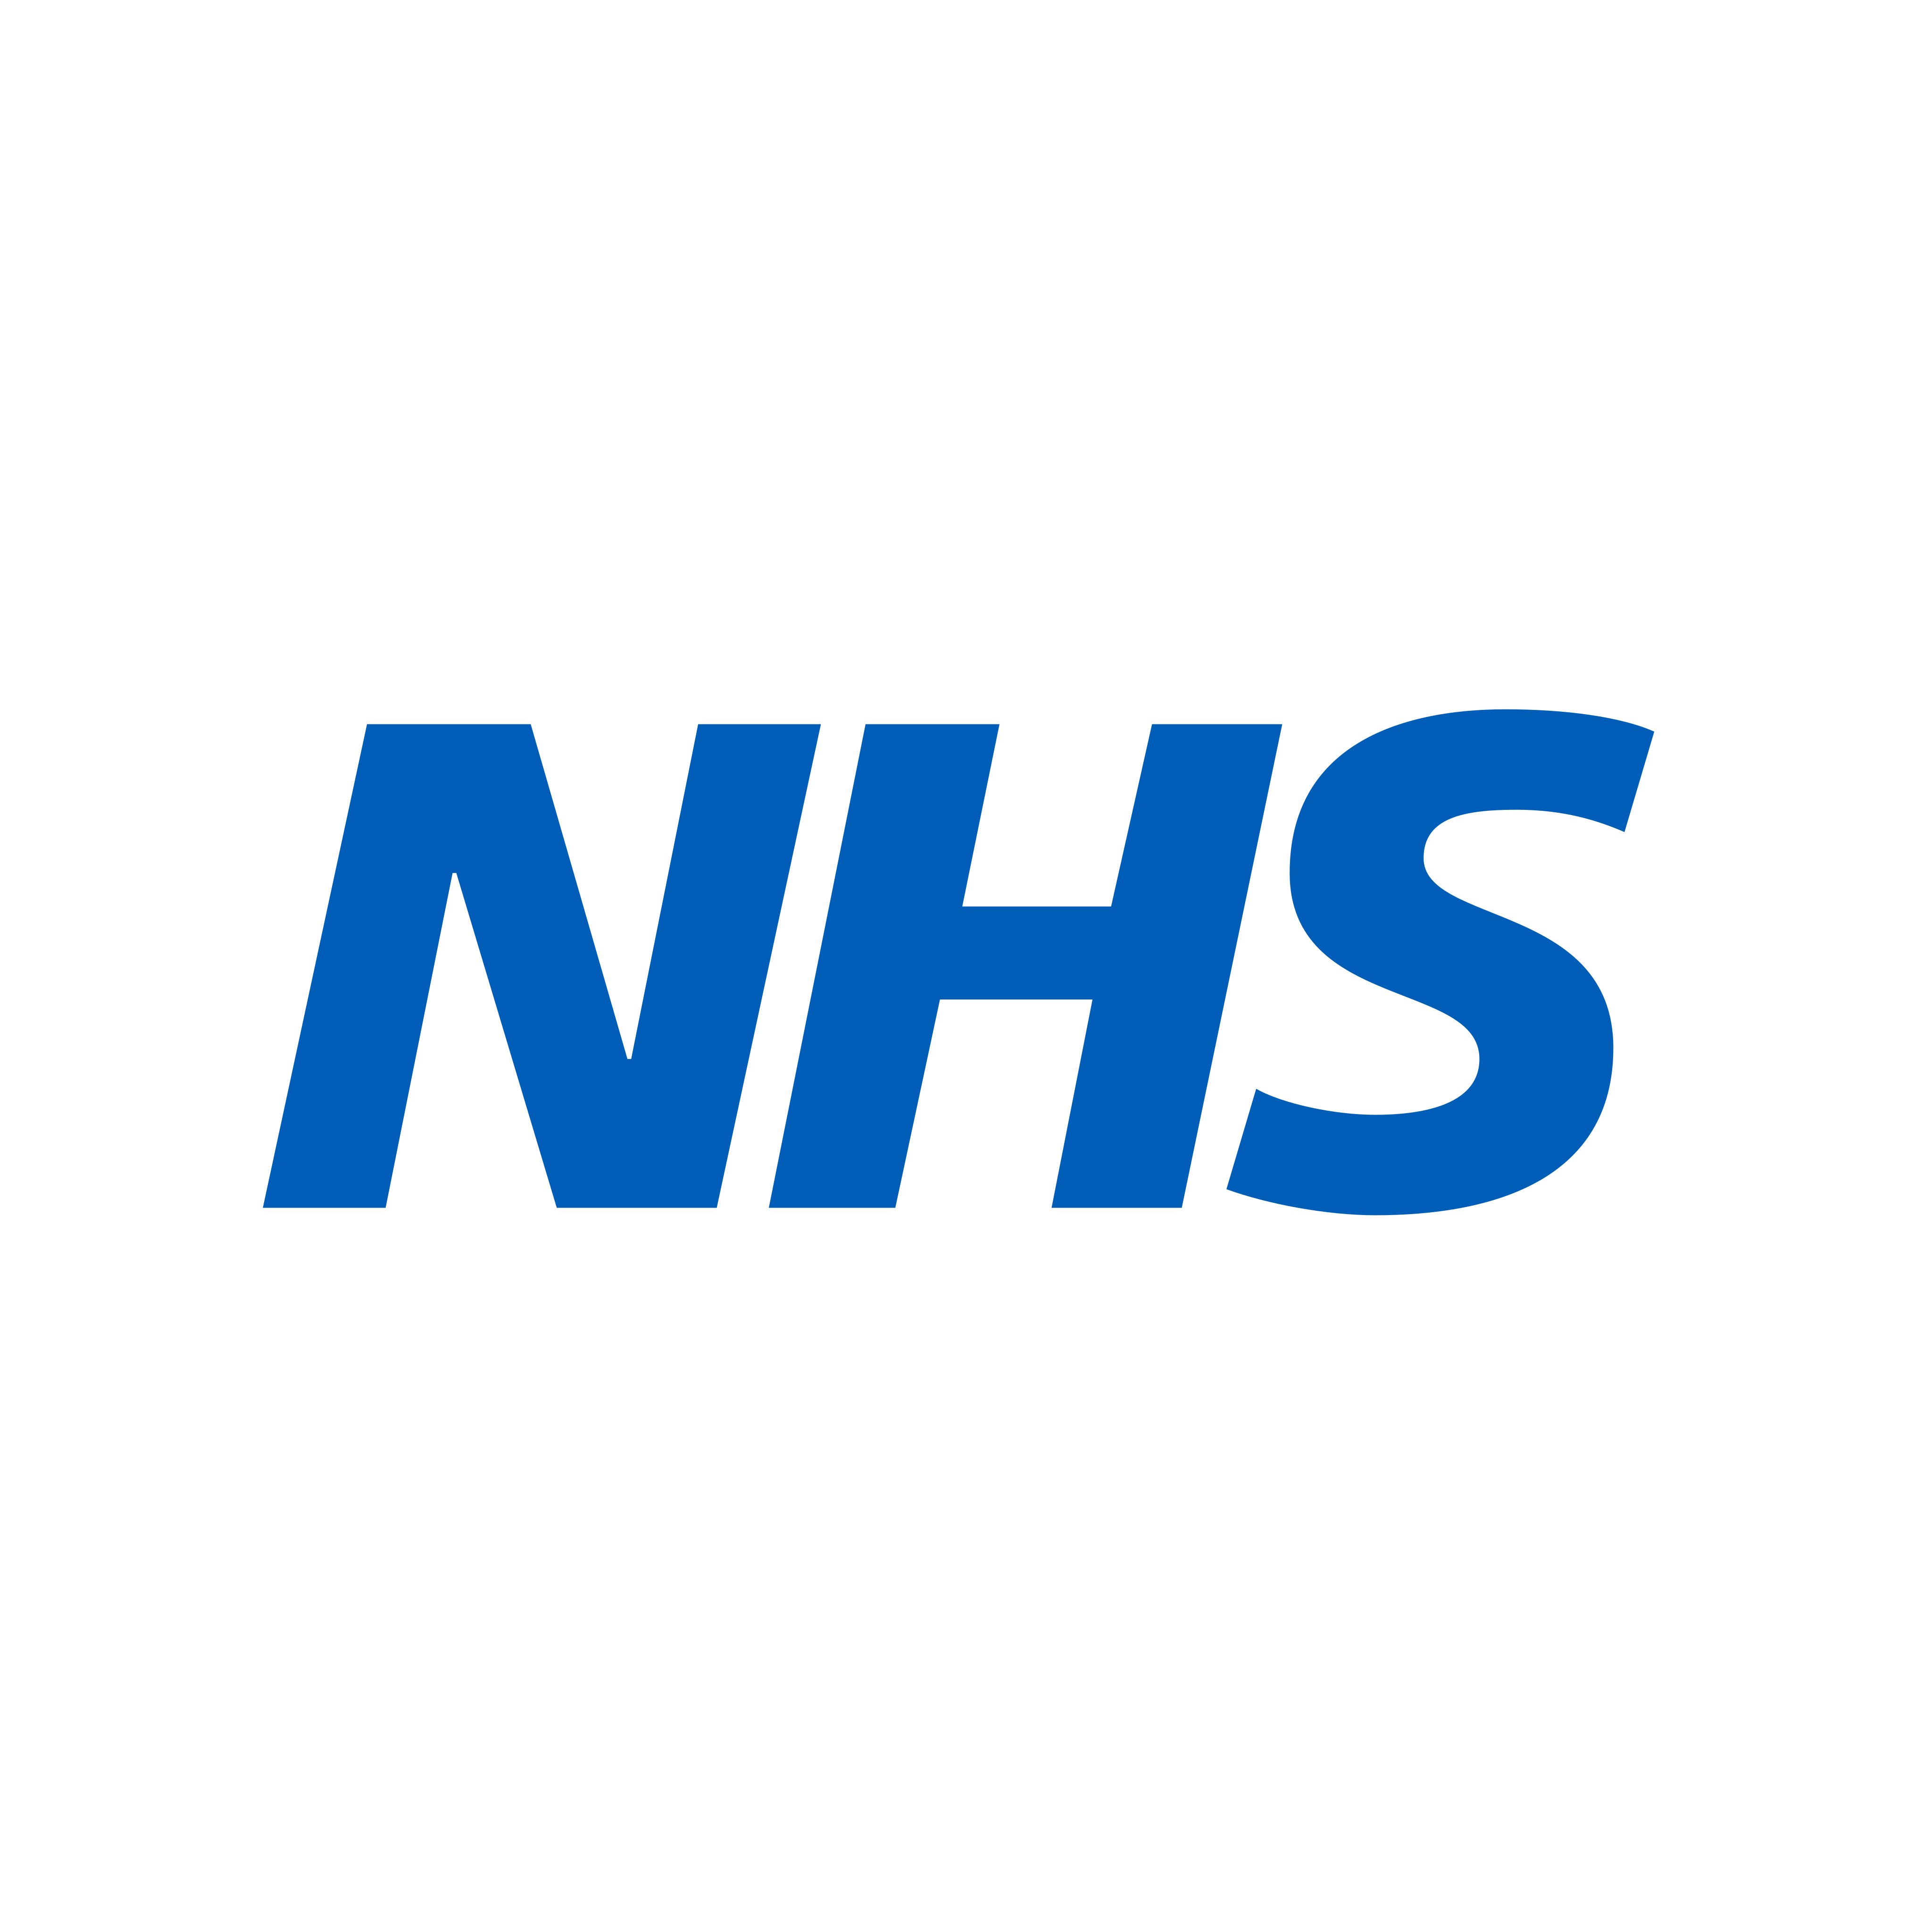 nhs logo 0 - NHS Logo - National Health Service Logo